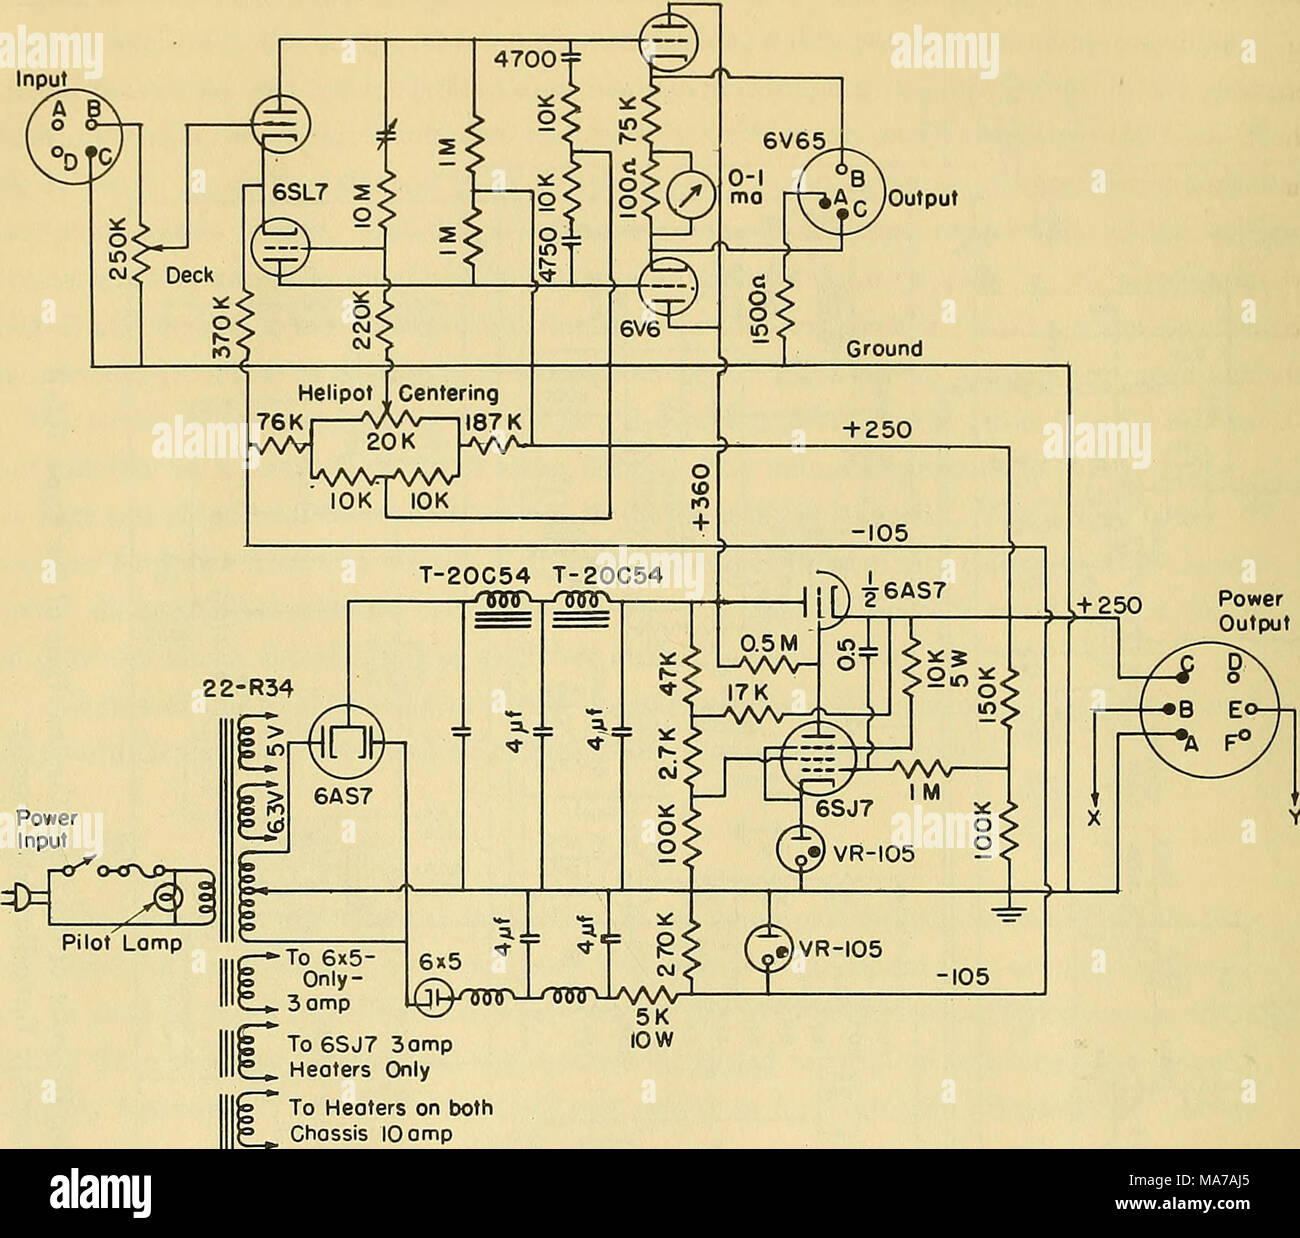 Schema Elettrico City 250 : Single phase supply immagini & single phase supply fotos stock alamy